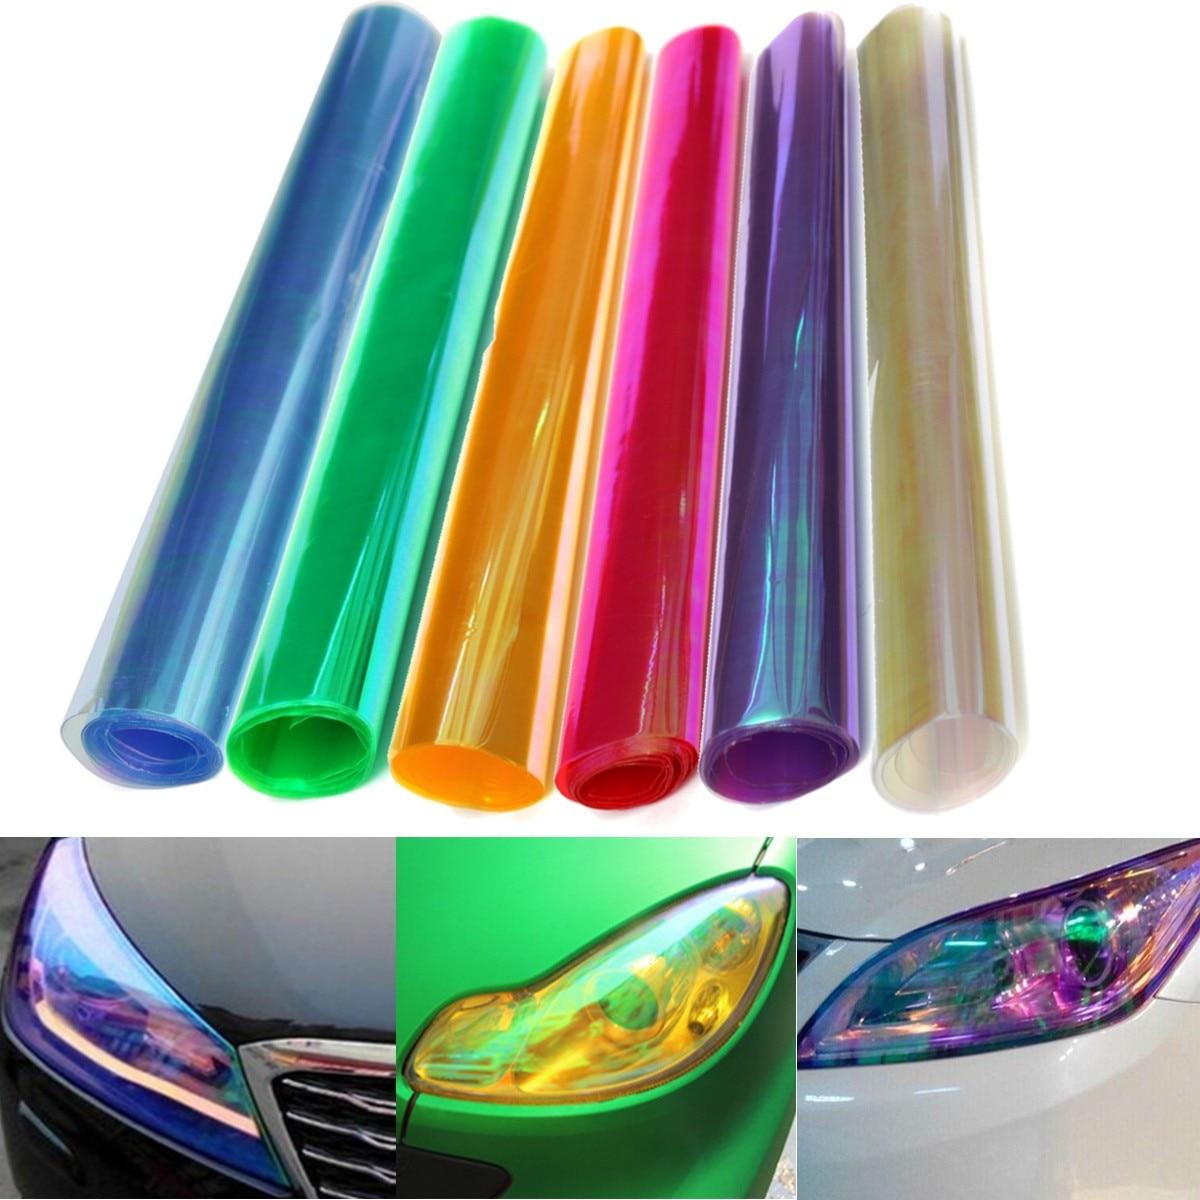 30X60cm 30X100cm Car Tint Fashion Headlight Taillight Fog Light Vinyl Smoke Film Sheet Sticker Cover Colorful